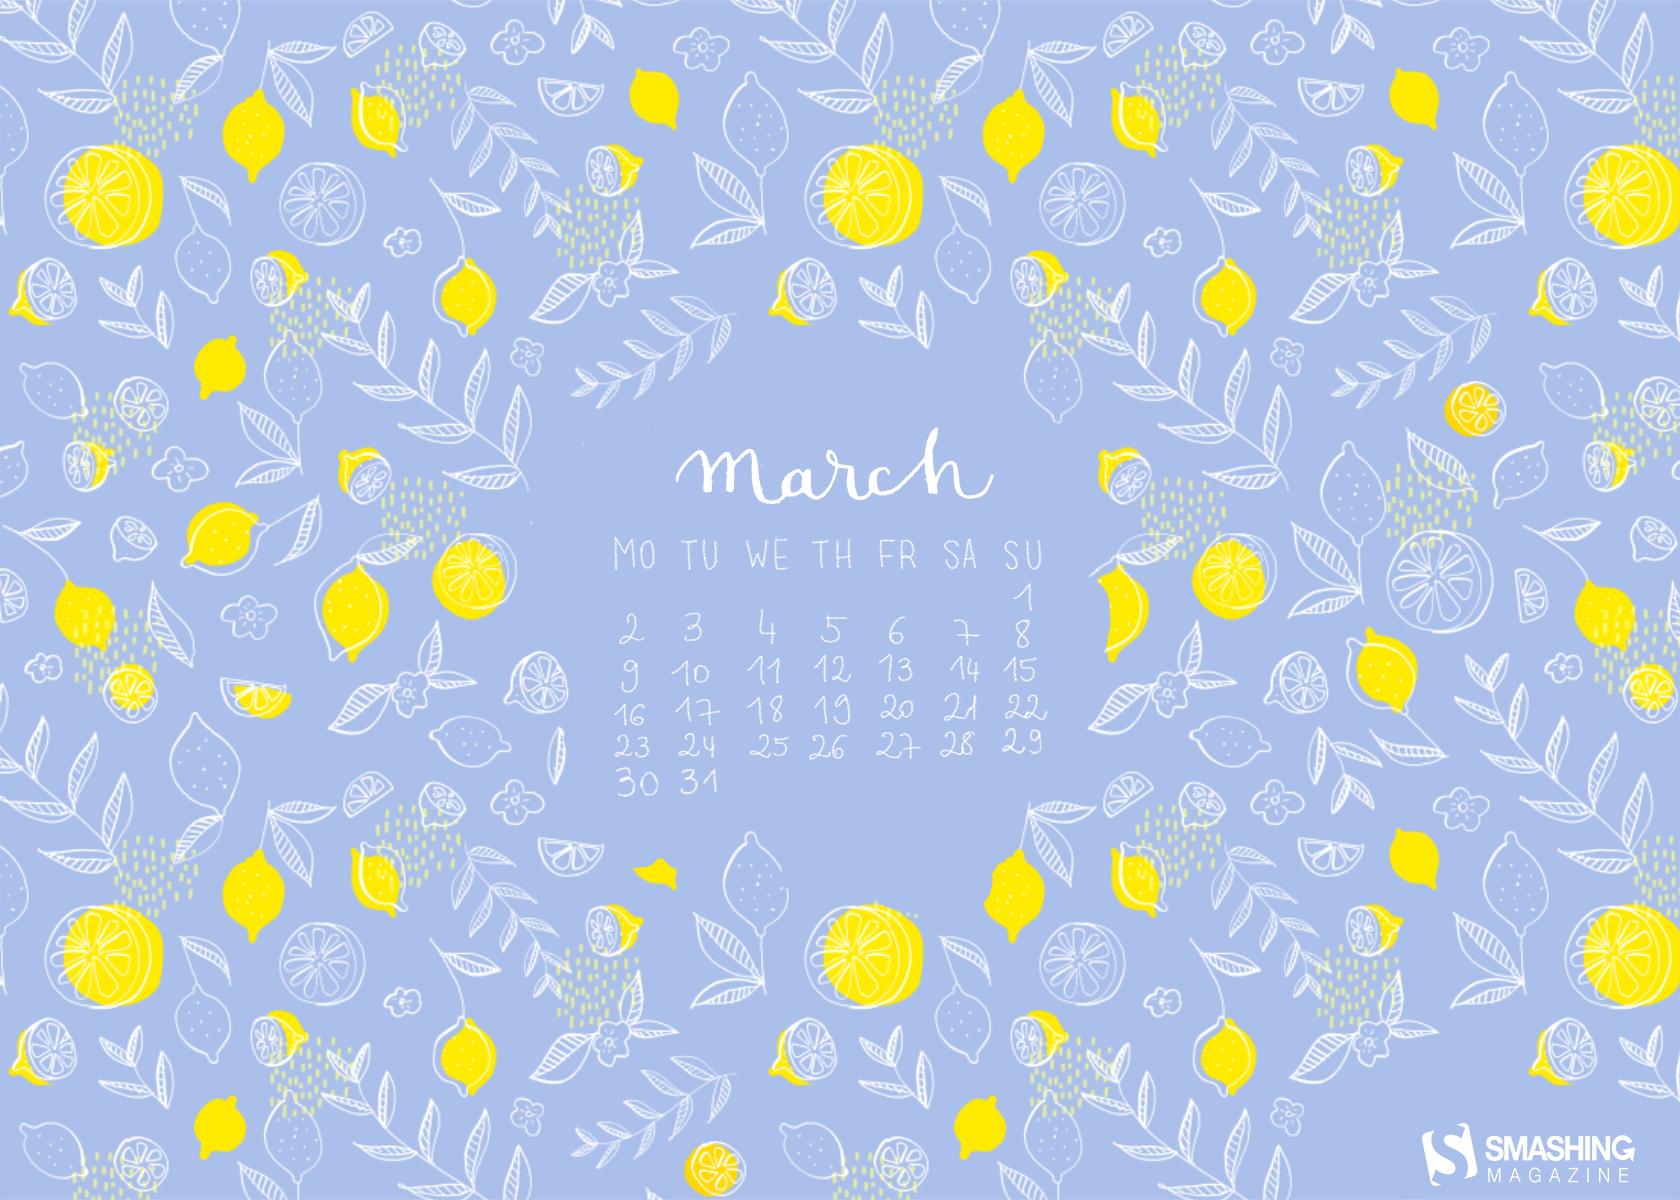 Desktop Wallpaper Calendars March 2015 Smashing Magazine 1680x1200